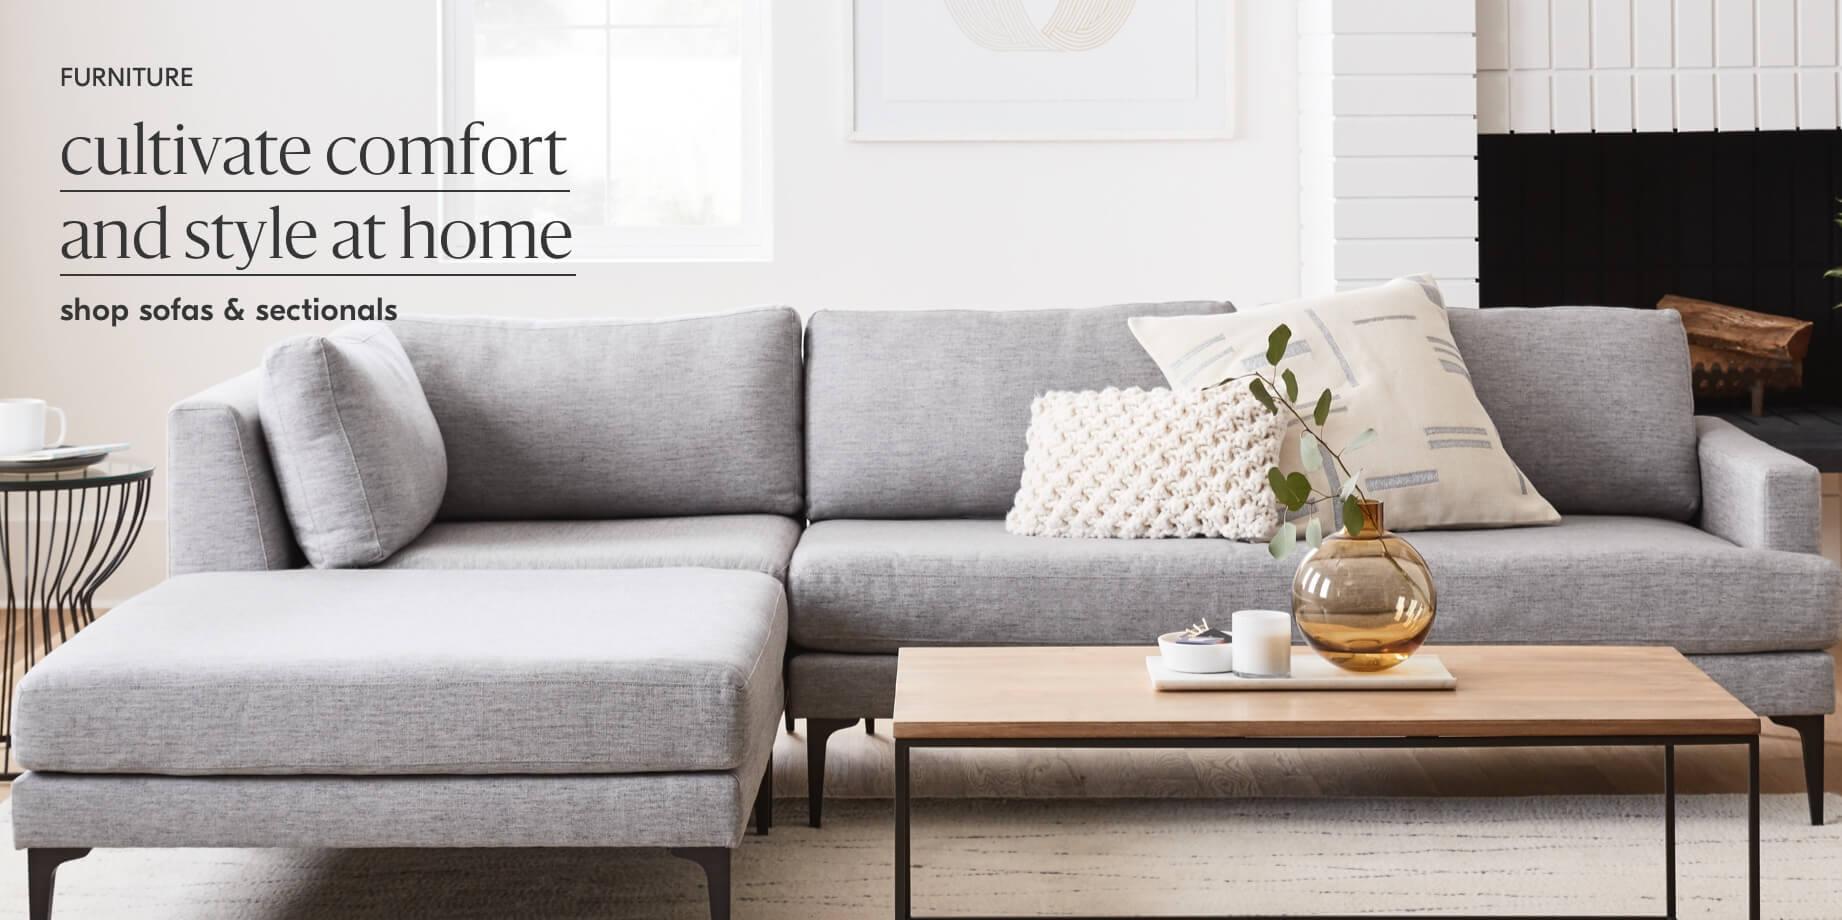 Modern Home & Office Furniture  West Elm UAE